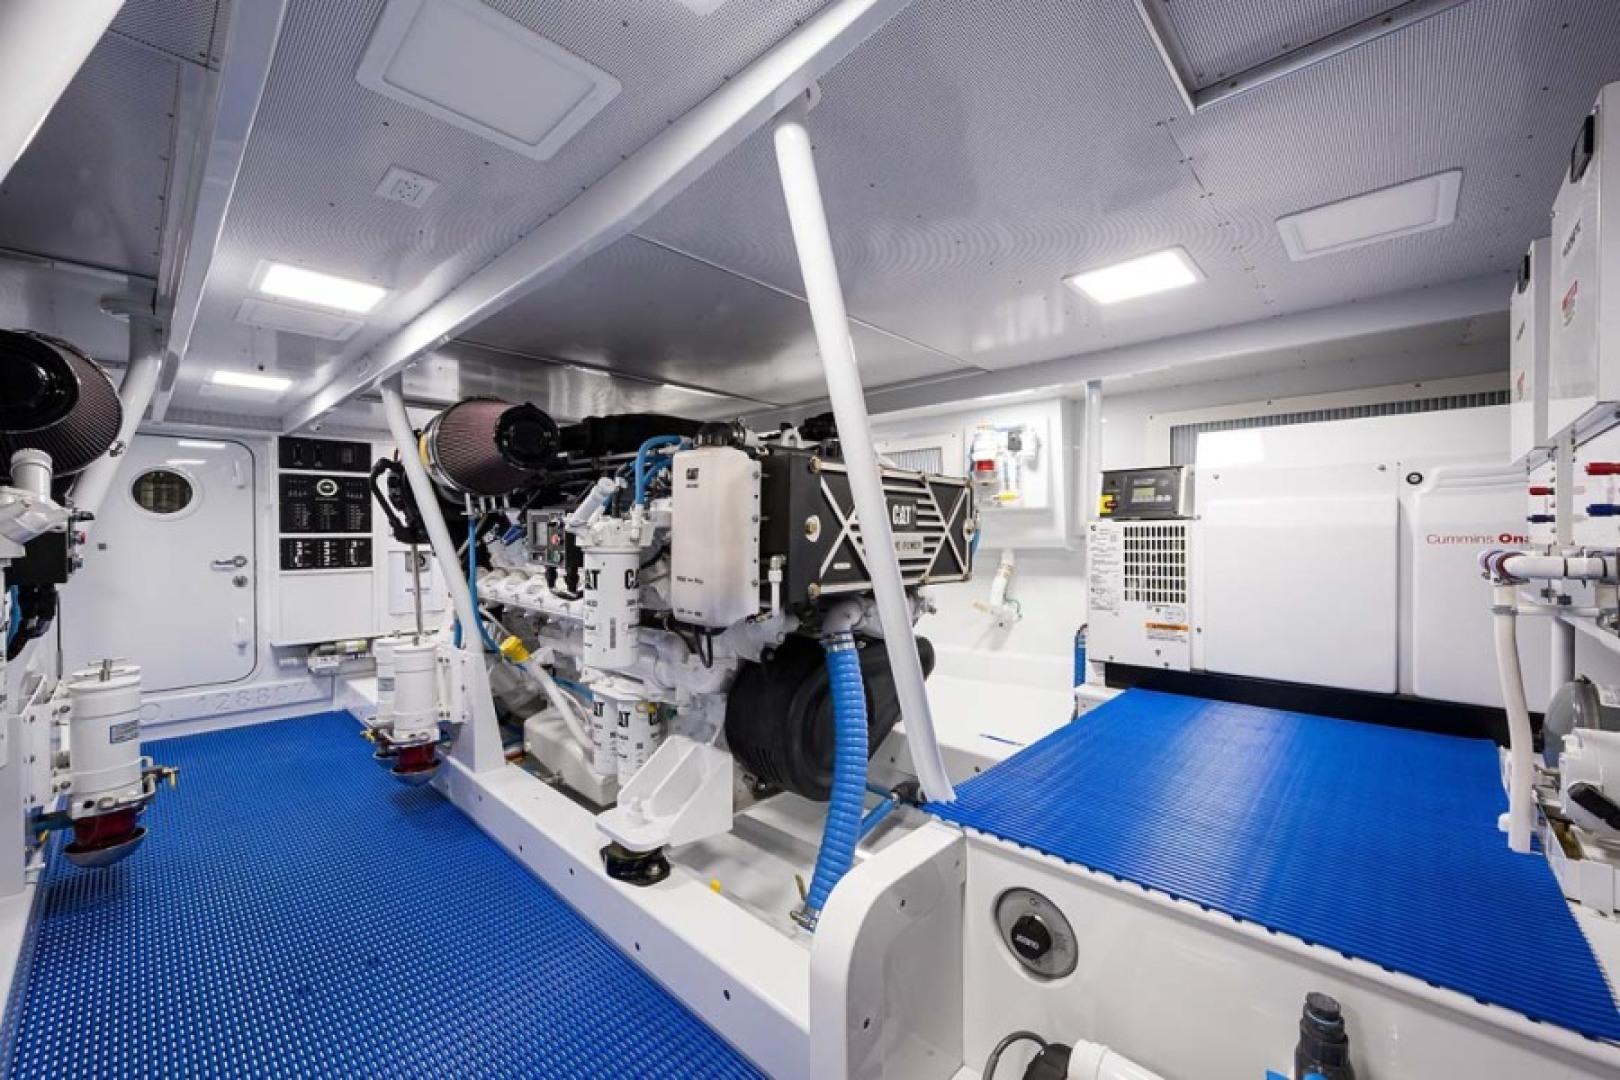 Rybovich-73 Convertible 2018-No Agenda North Palm Beach-Florida-United States-Engine Room-1486394 | Thumbnail